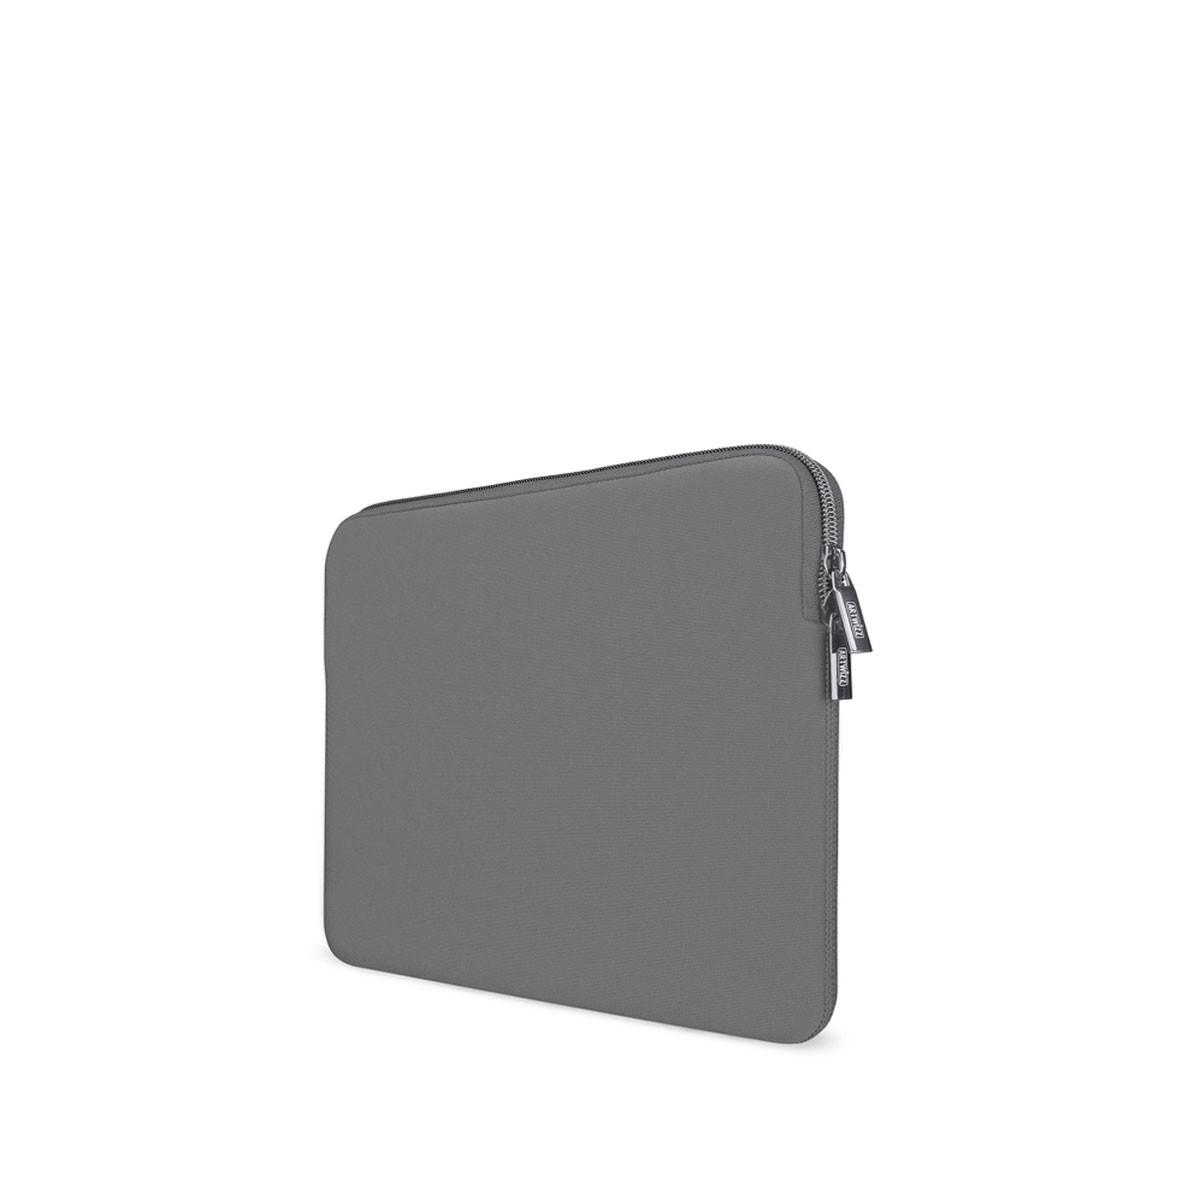 "Obal na MacBook Pro 13"" Artwizz - šedý"